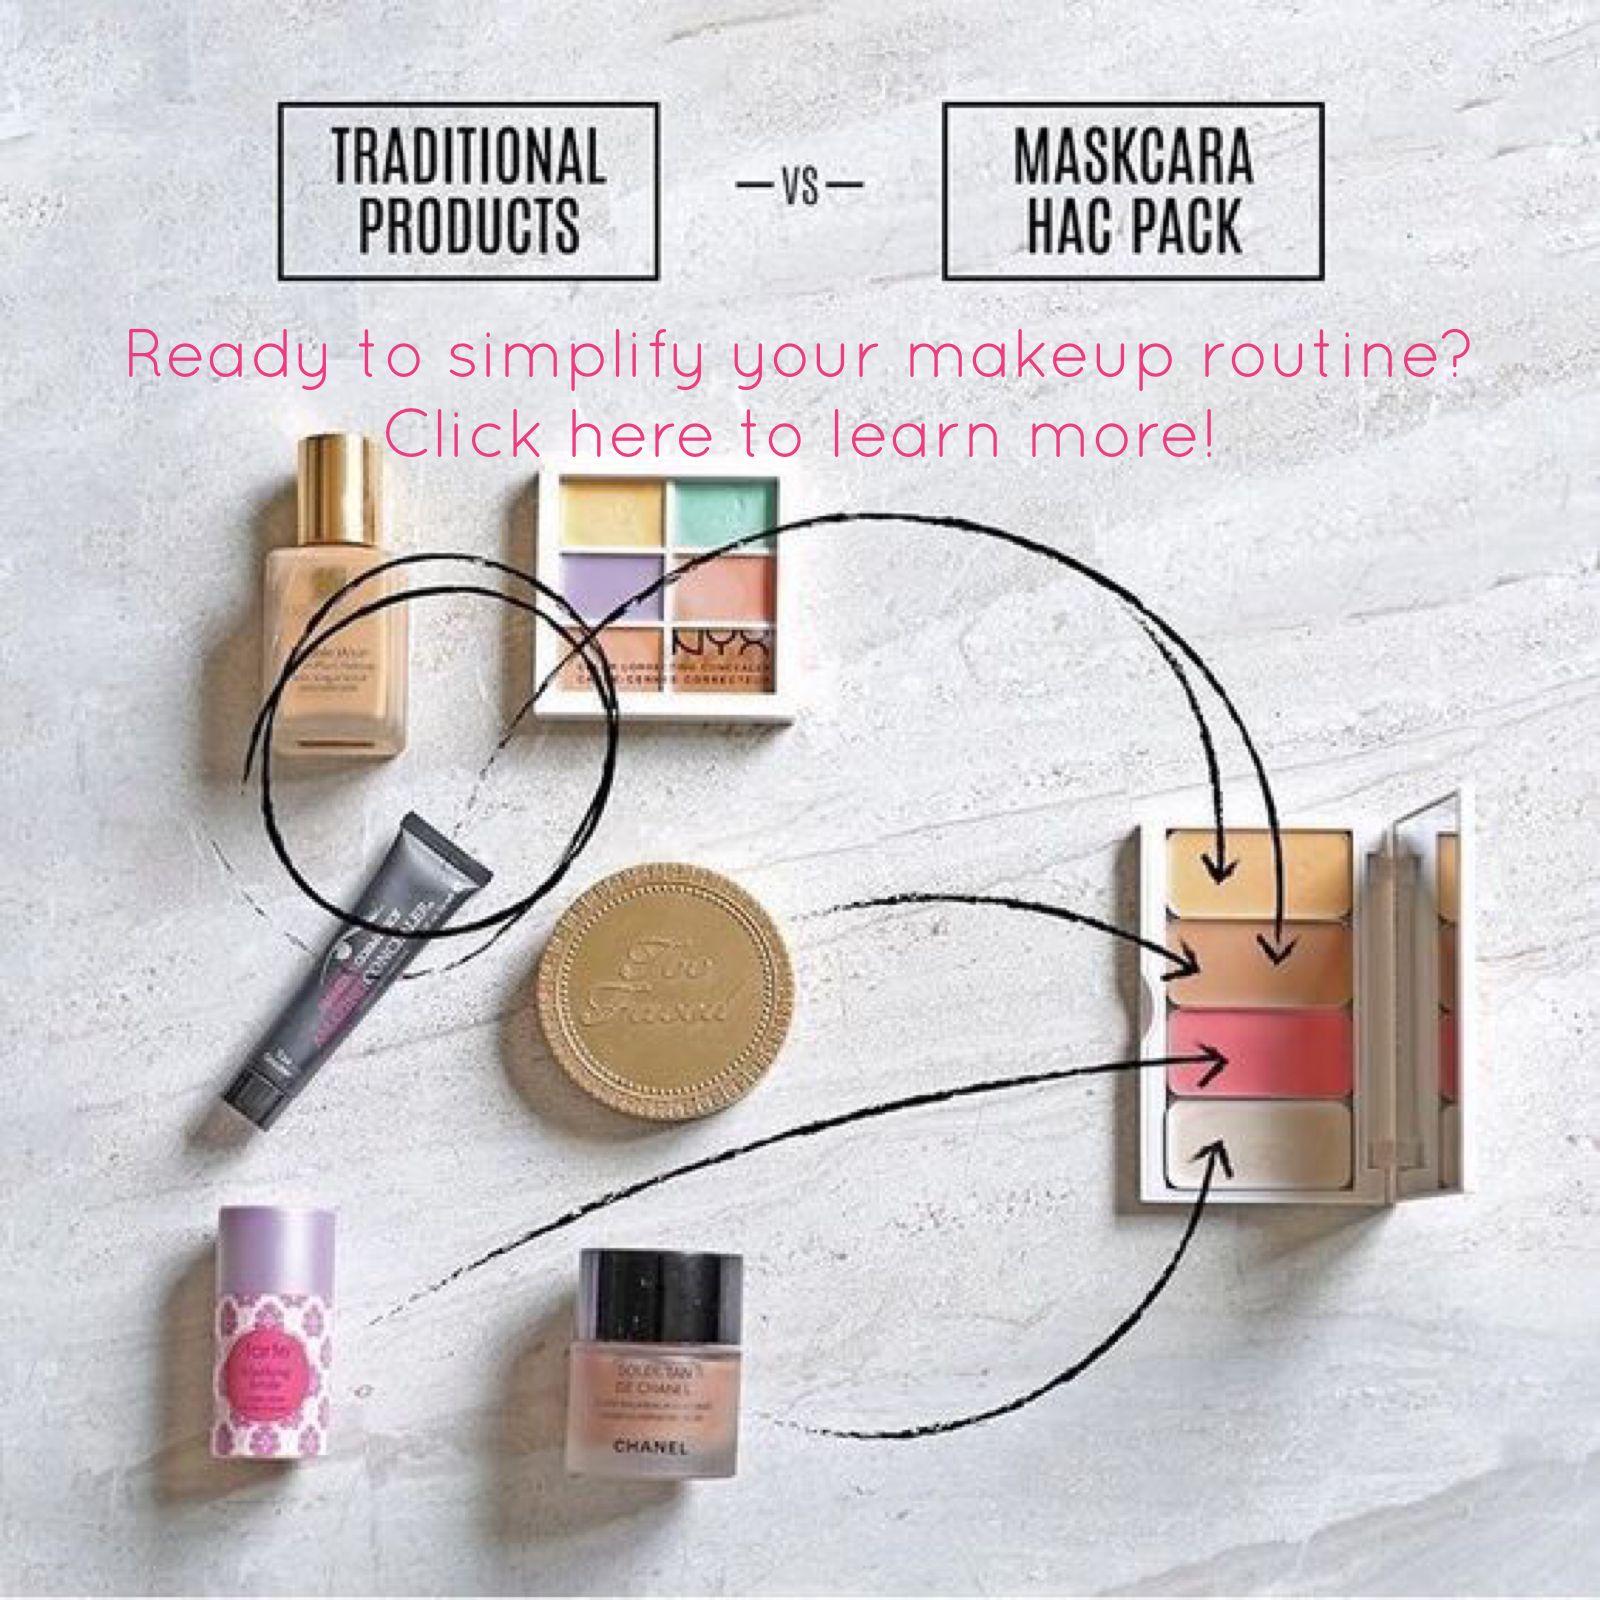 Maskcara Beauty highlighting and contouring. Easy makeup